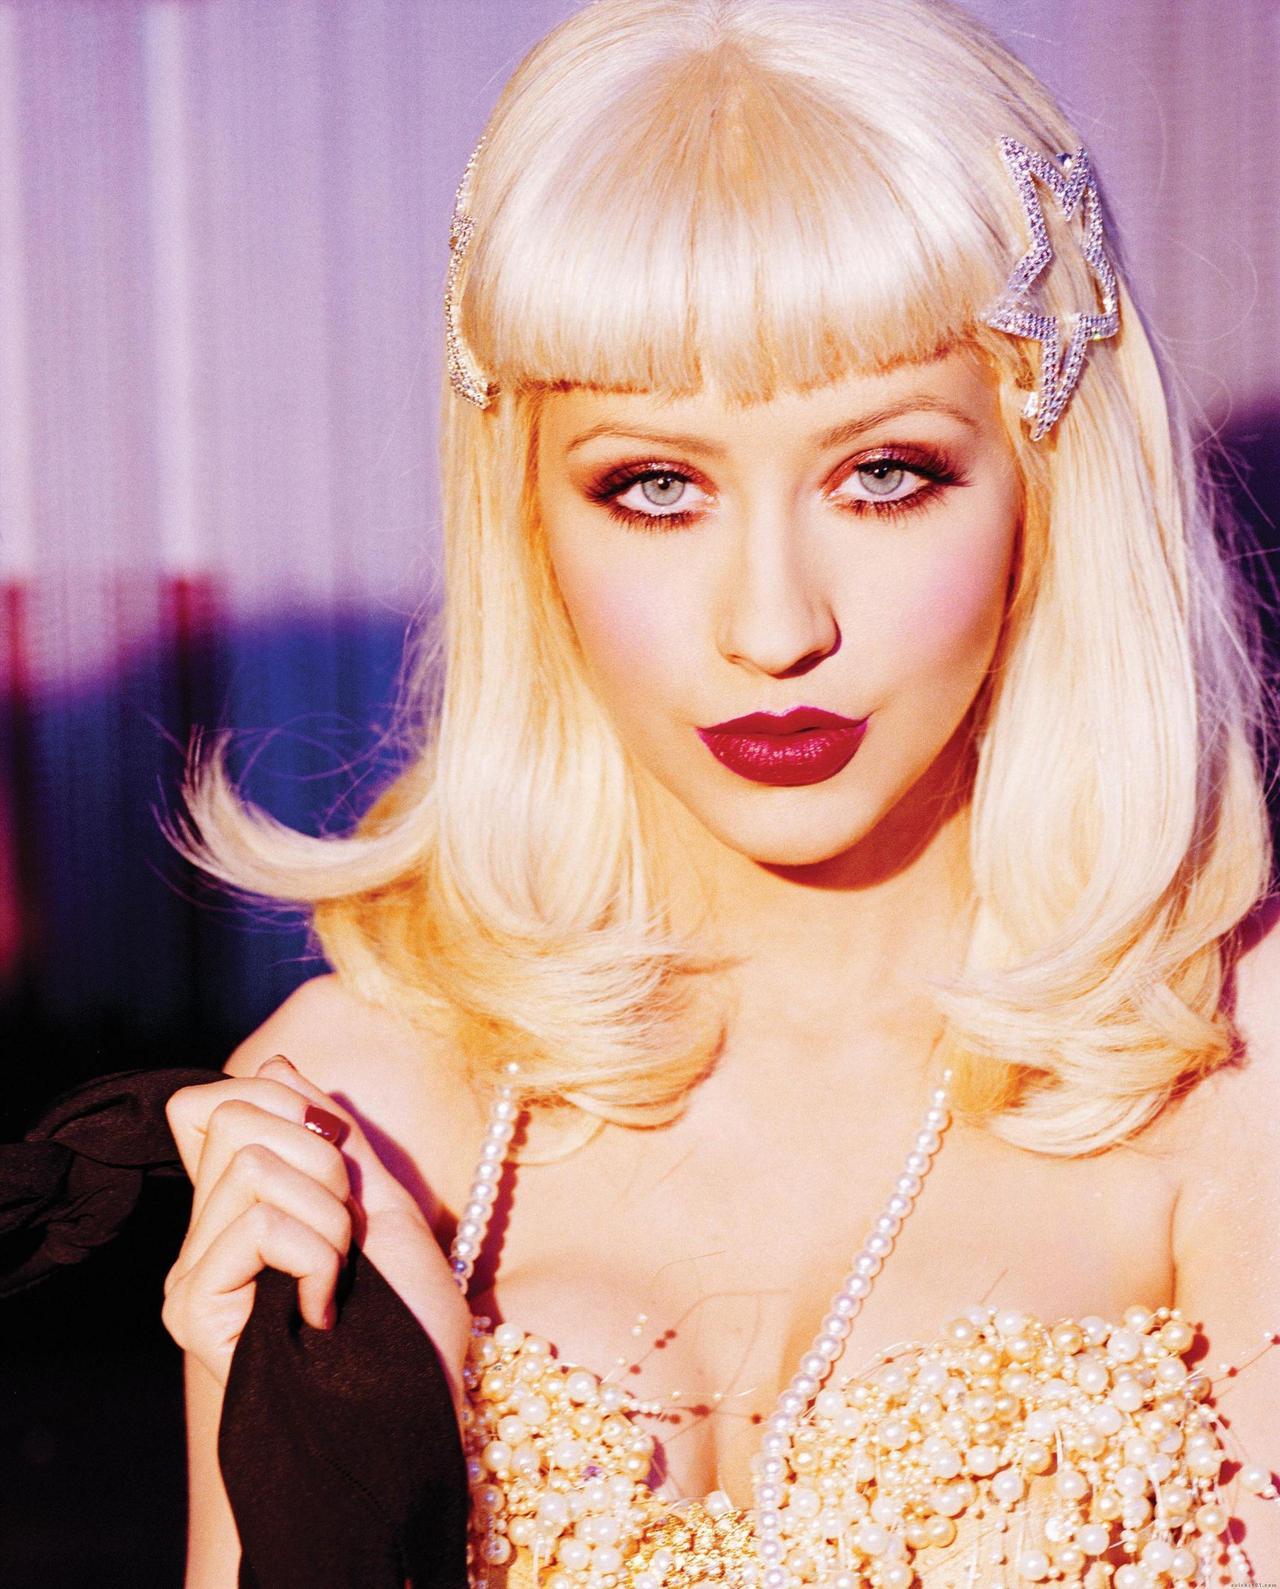 Christina Aguilera photo 6555 of 9083 pics, wallpaper ... Christina Aguilera